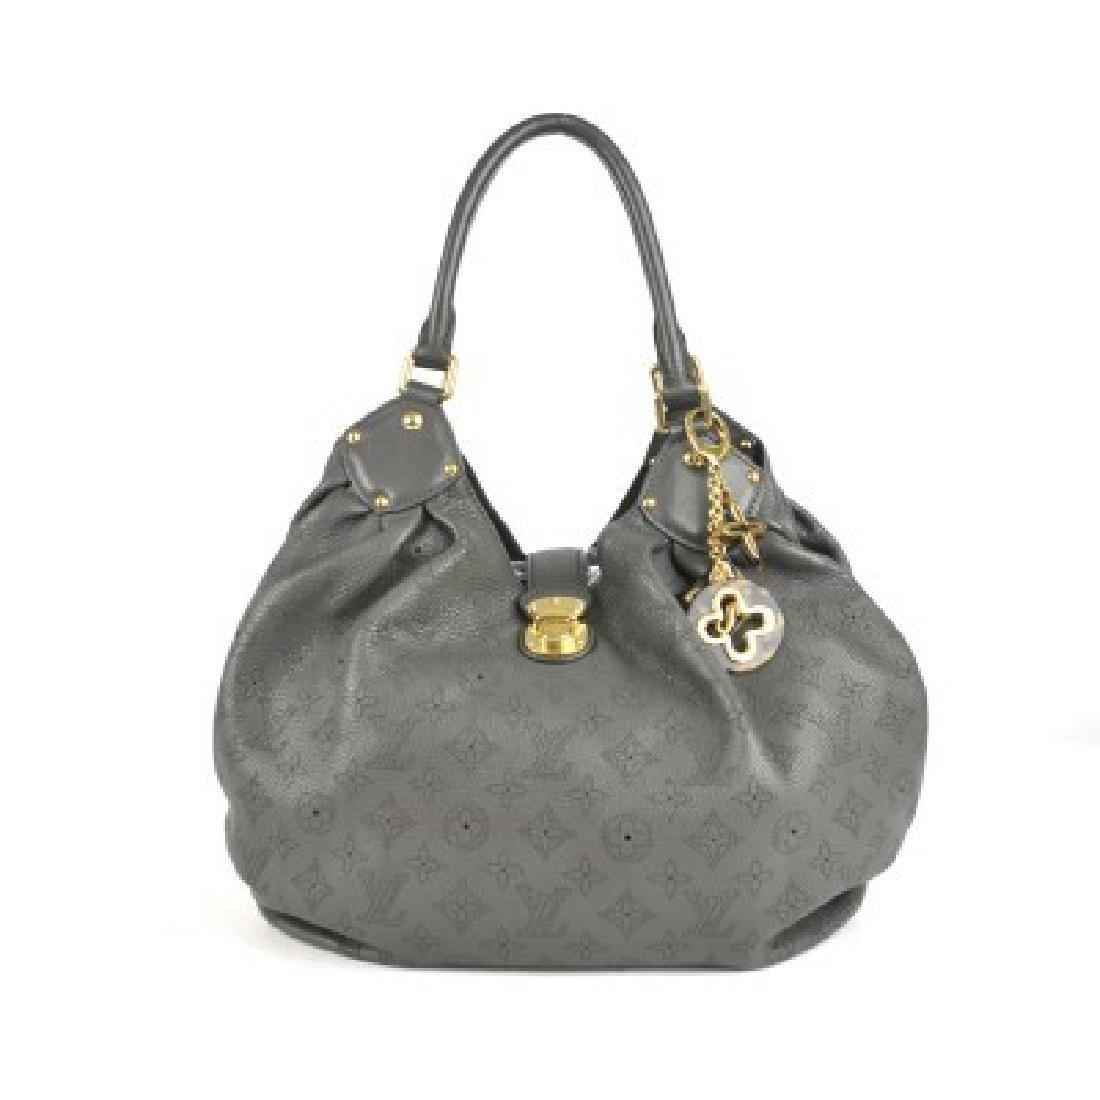 Louis Vuitton Handbag Mahina Hobo